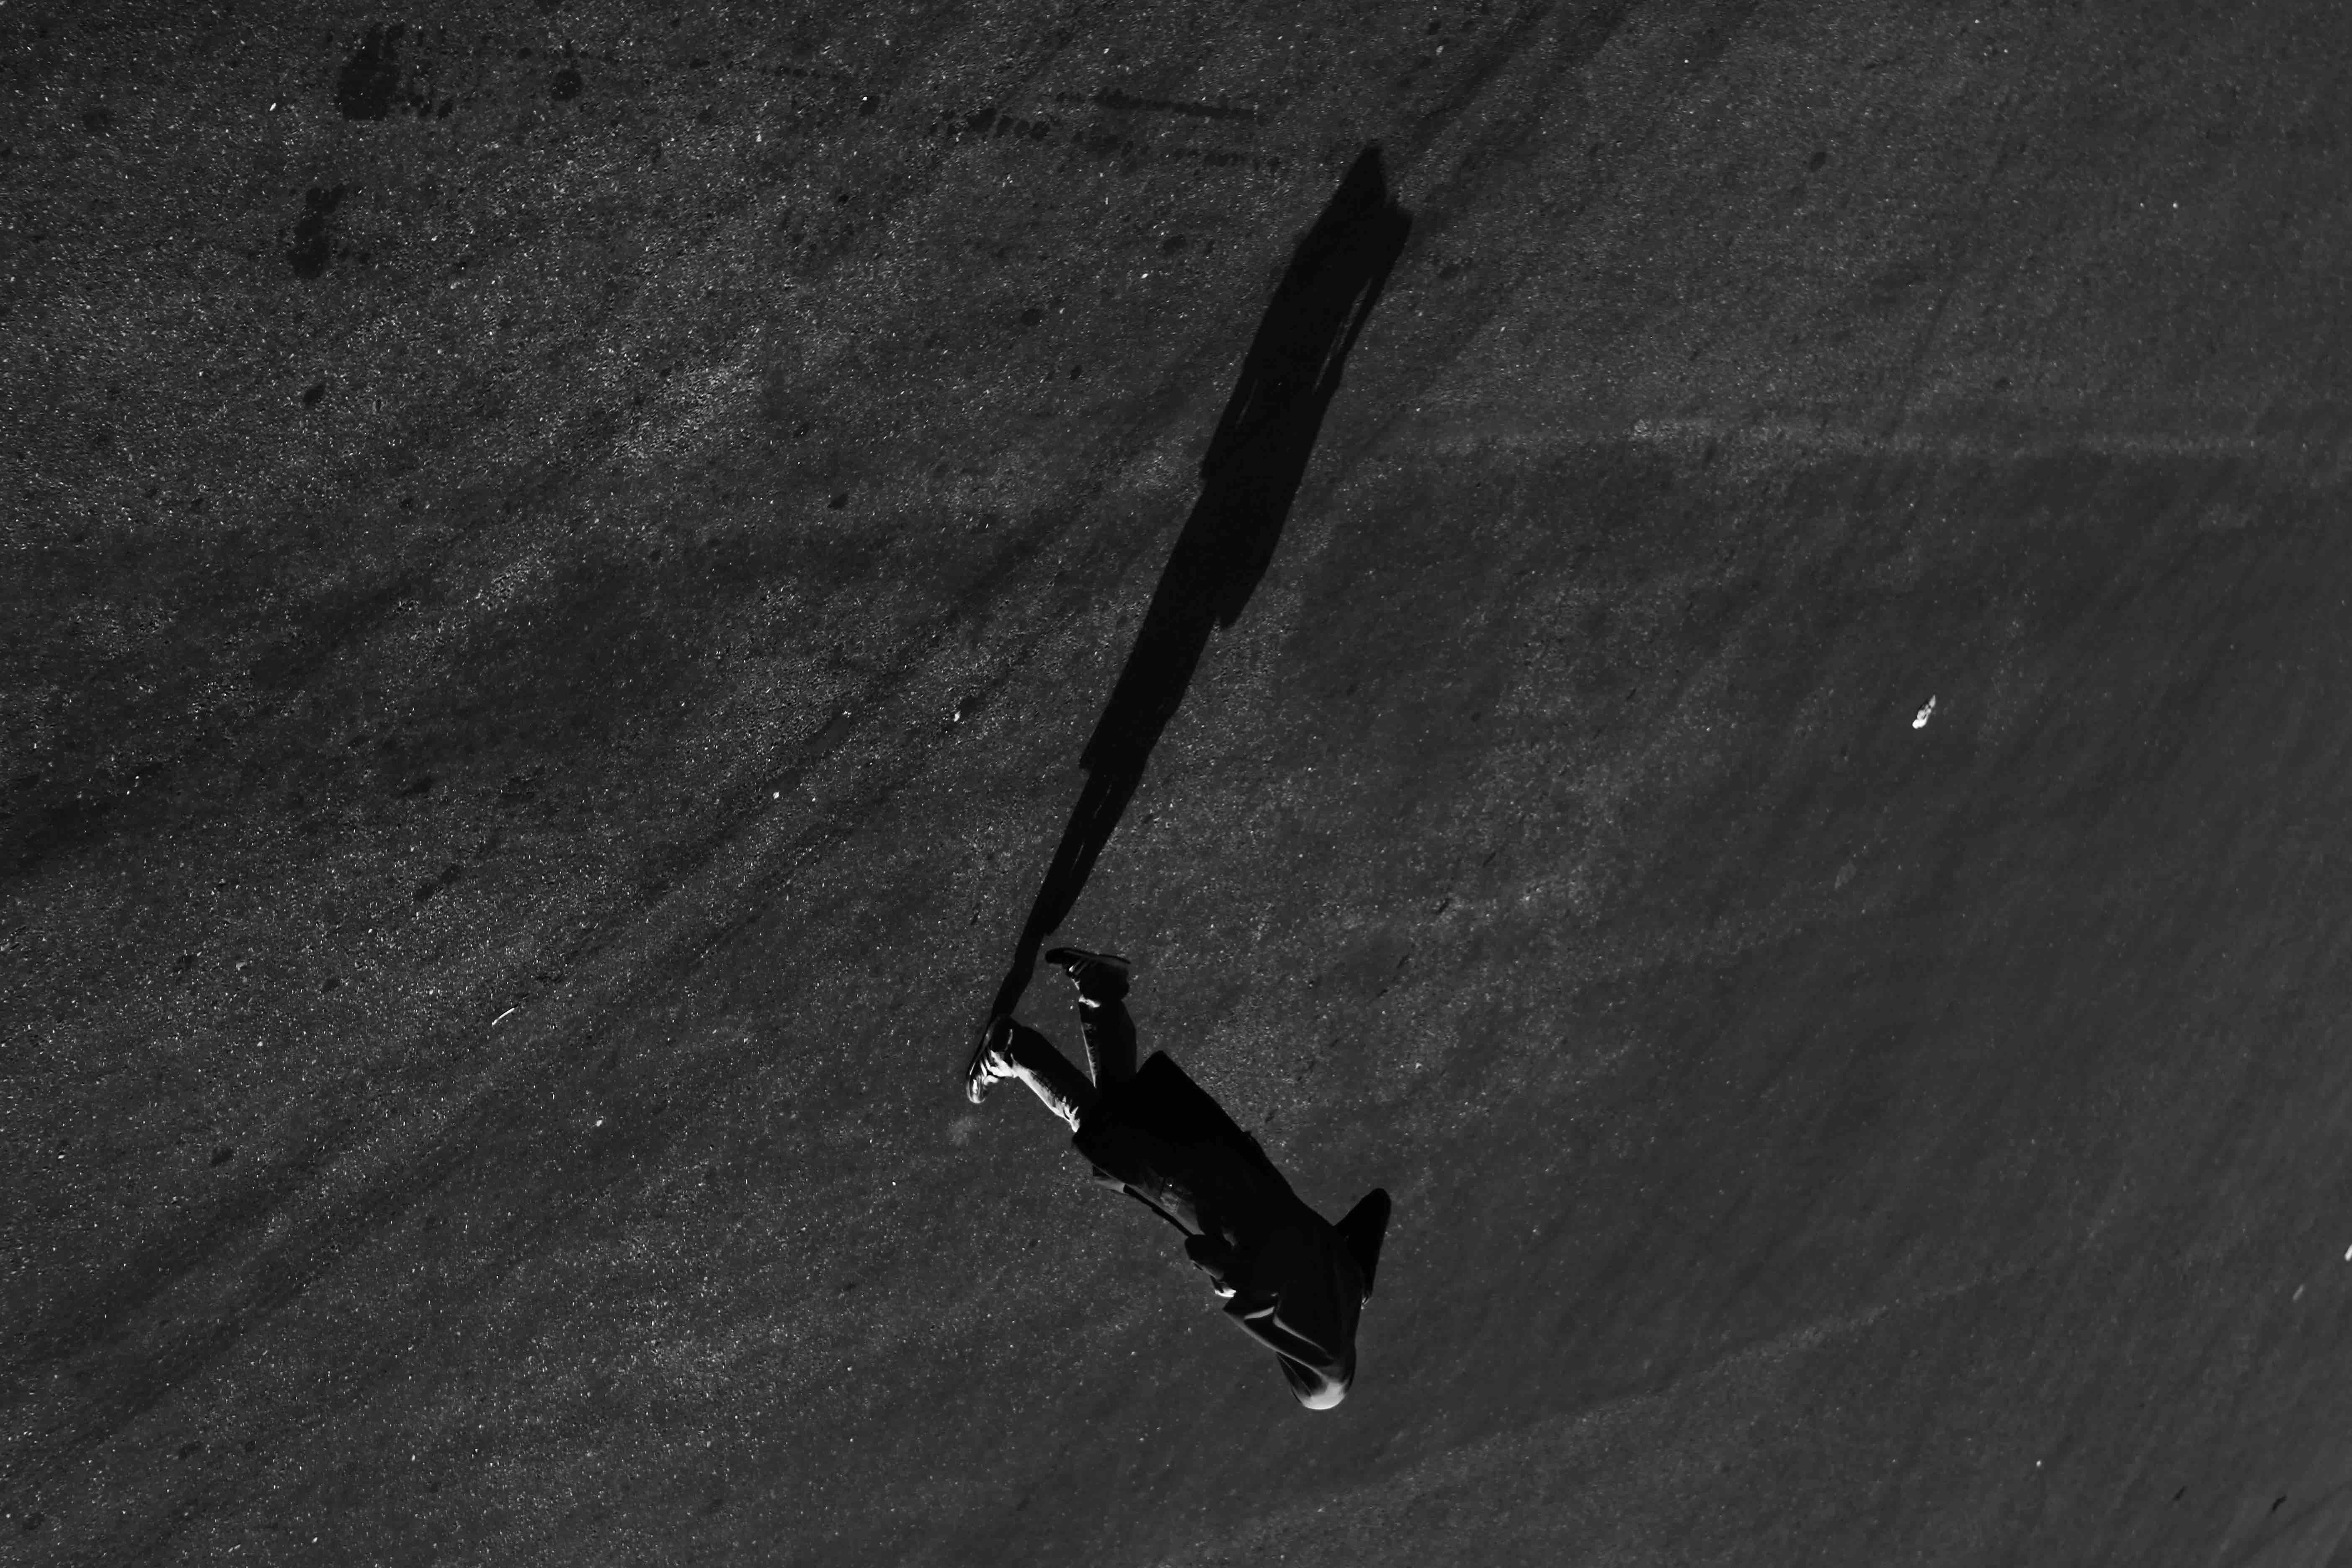 Untitled (15)_ The Life Of Shadows Series - Nehdaran_ Dana